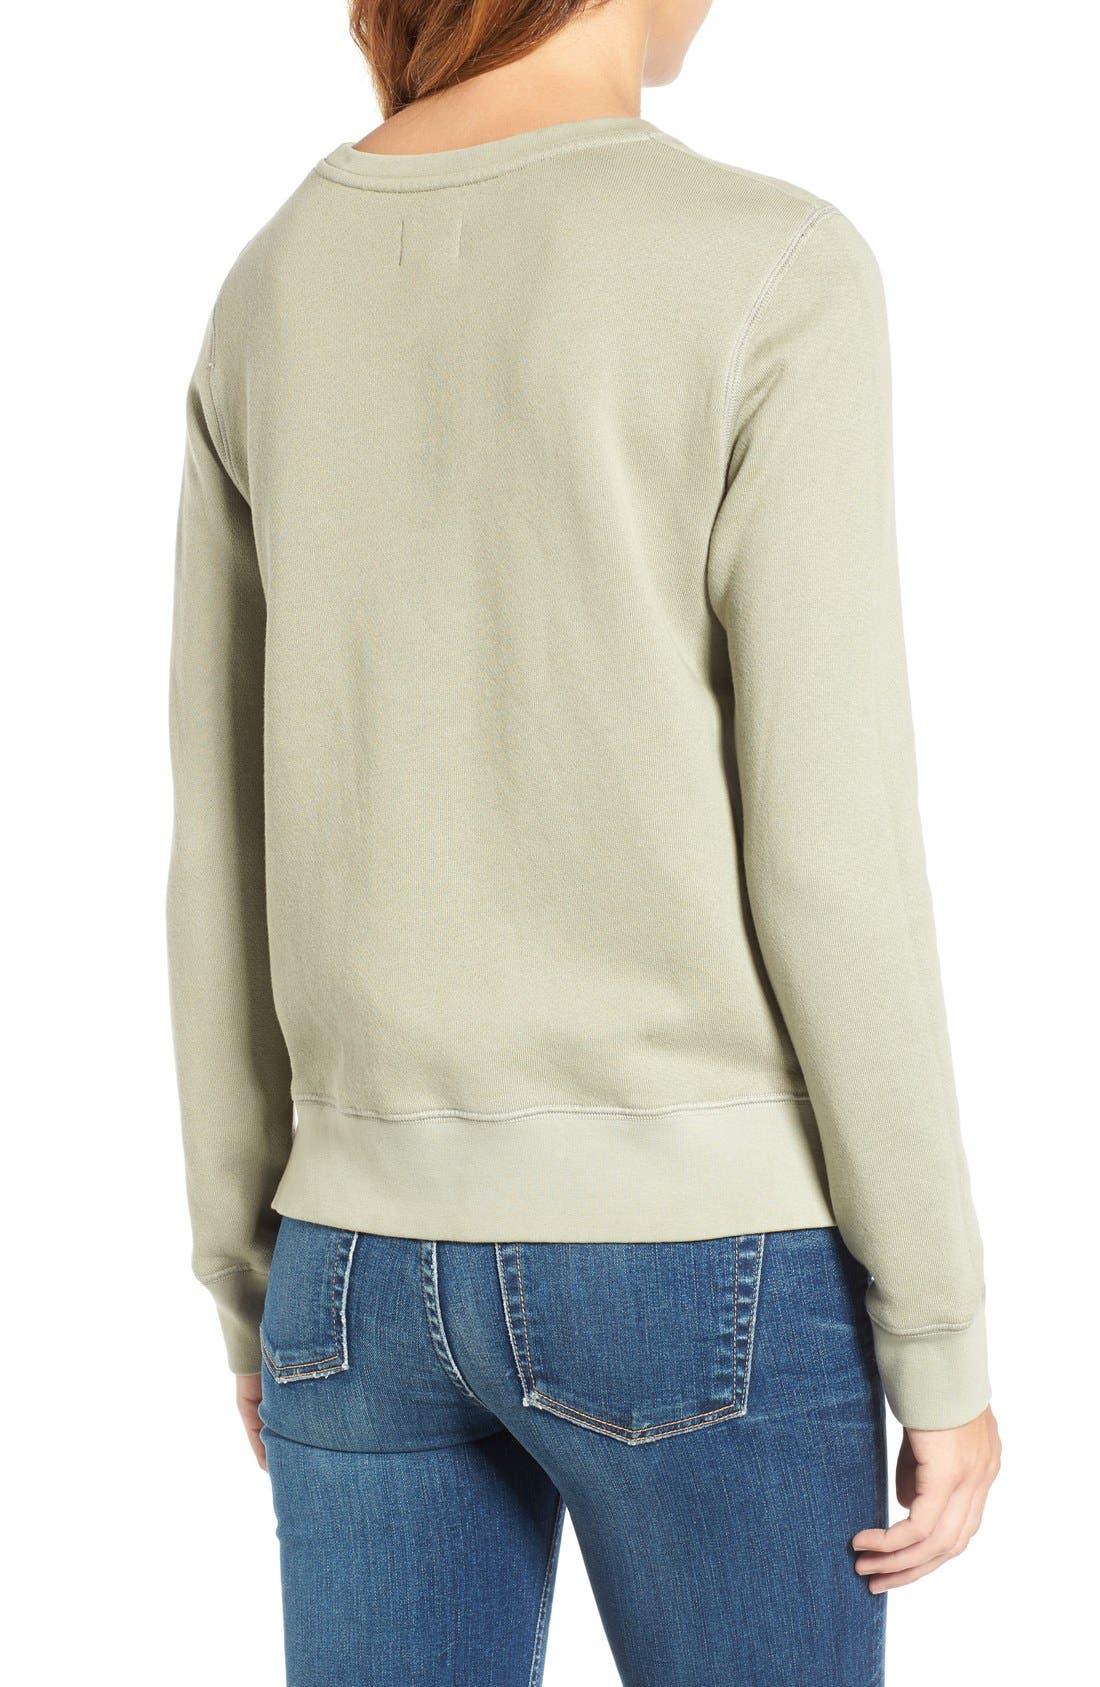 Army of Lovers Side Zip Sweatshirt,                             Alternate thumbnail 2, color,                             Army